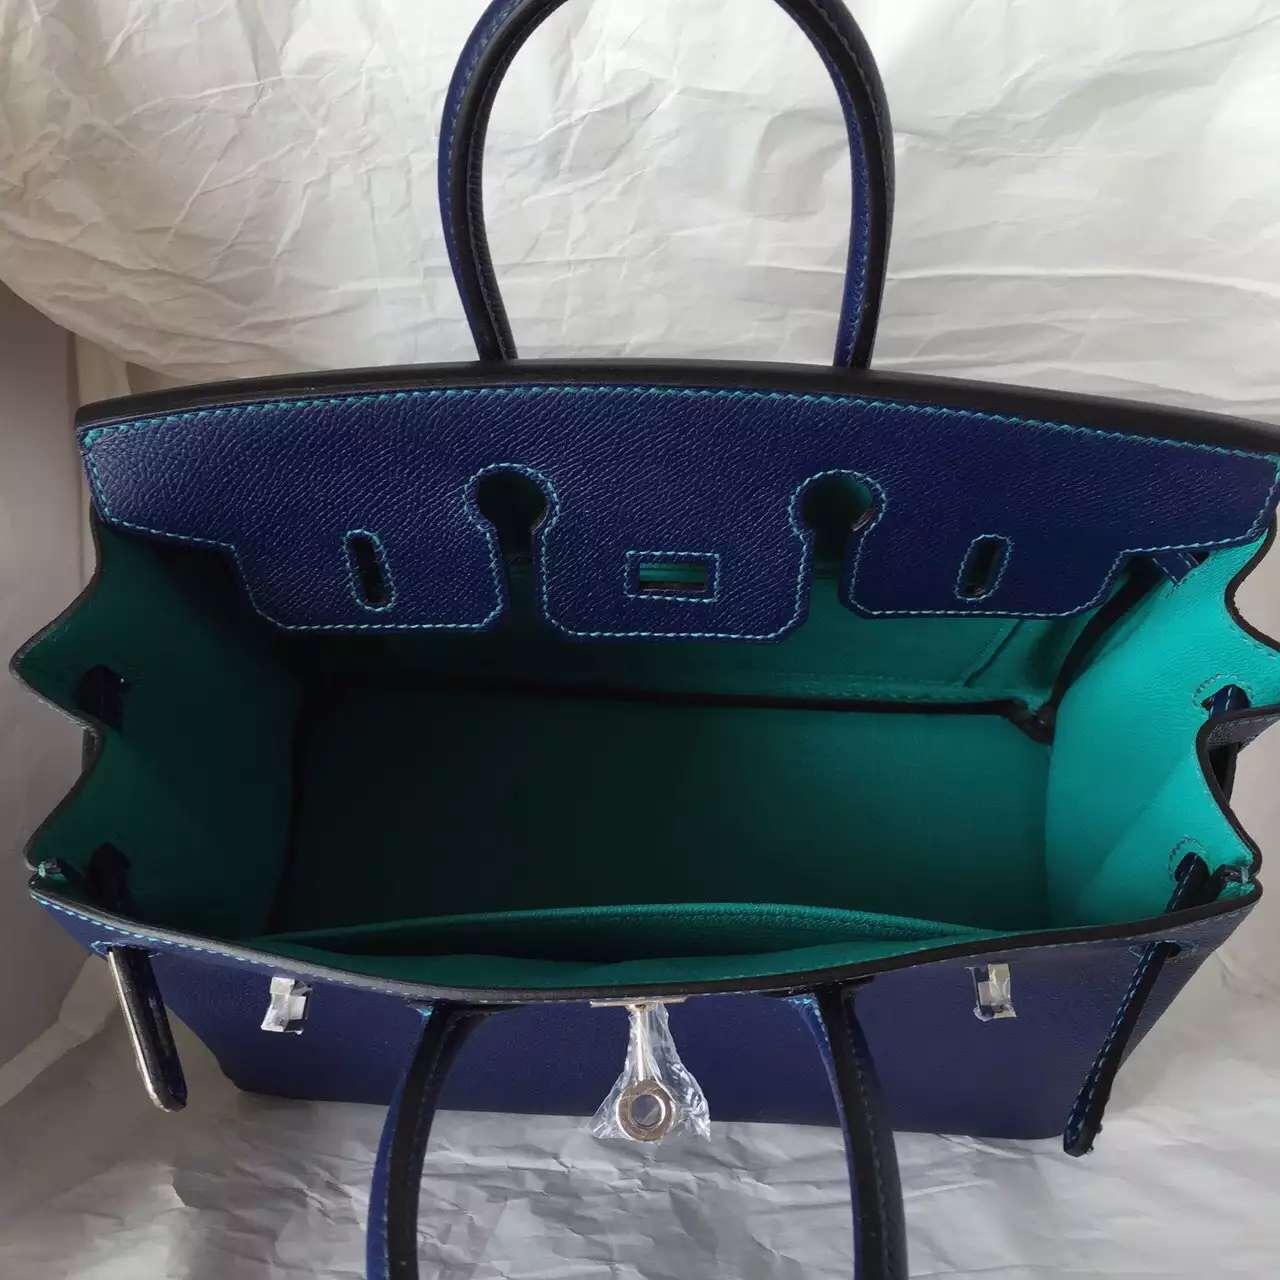 Wholesale Hermes Epsom Calfskin Leather Birkin Bag 25CM in 7K Blue Saphir/7F Lagon Color